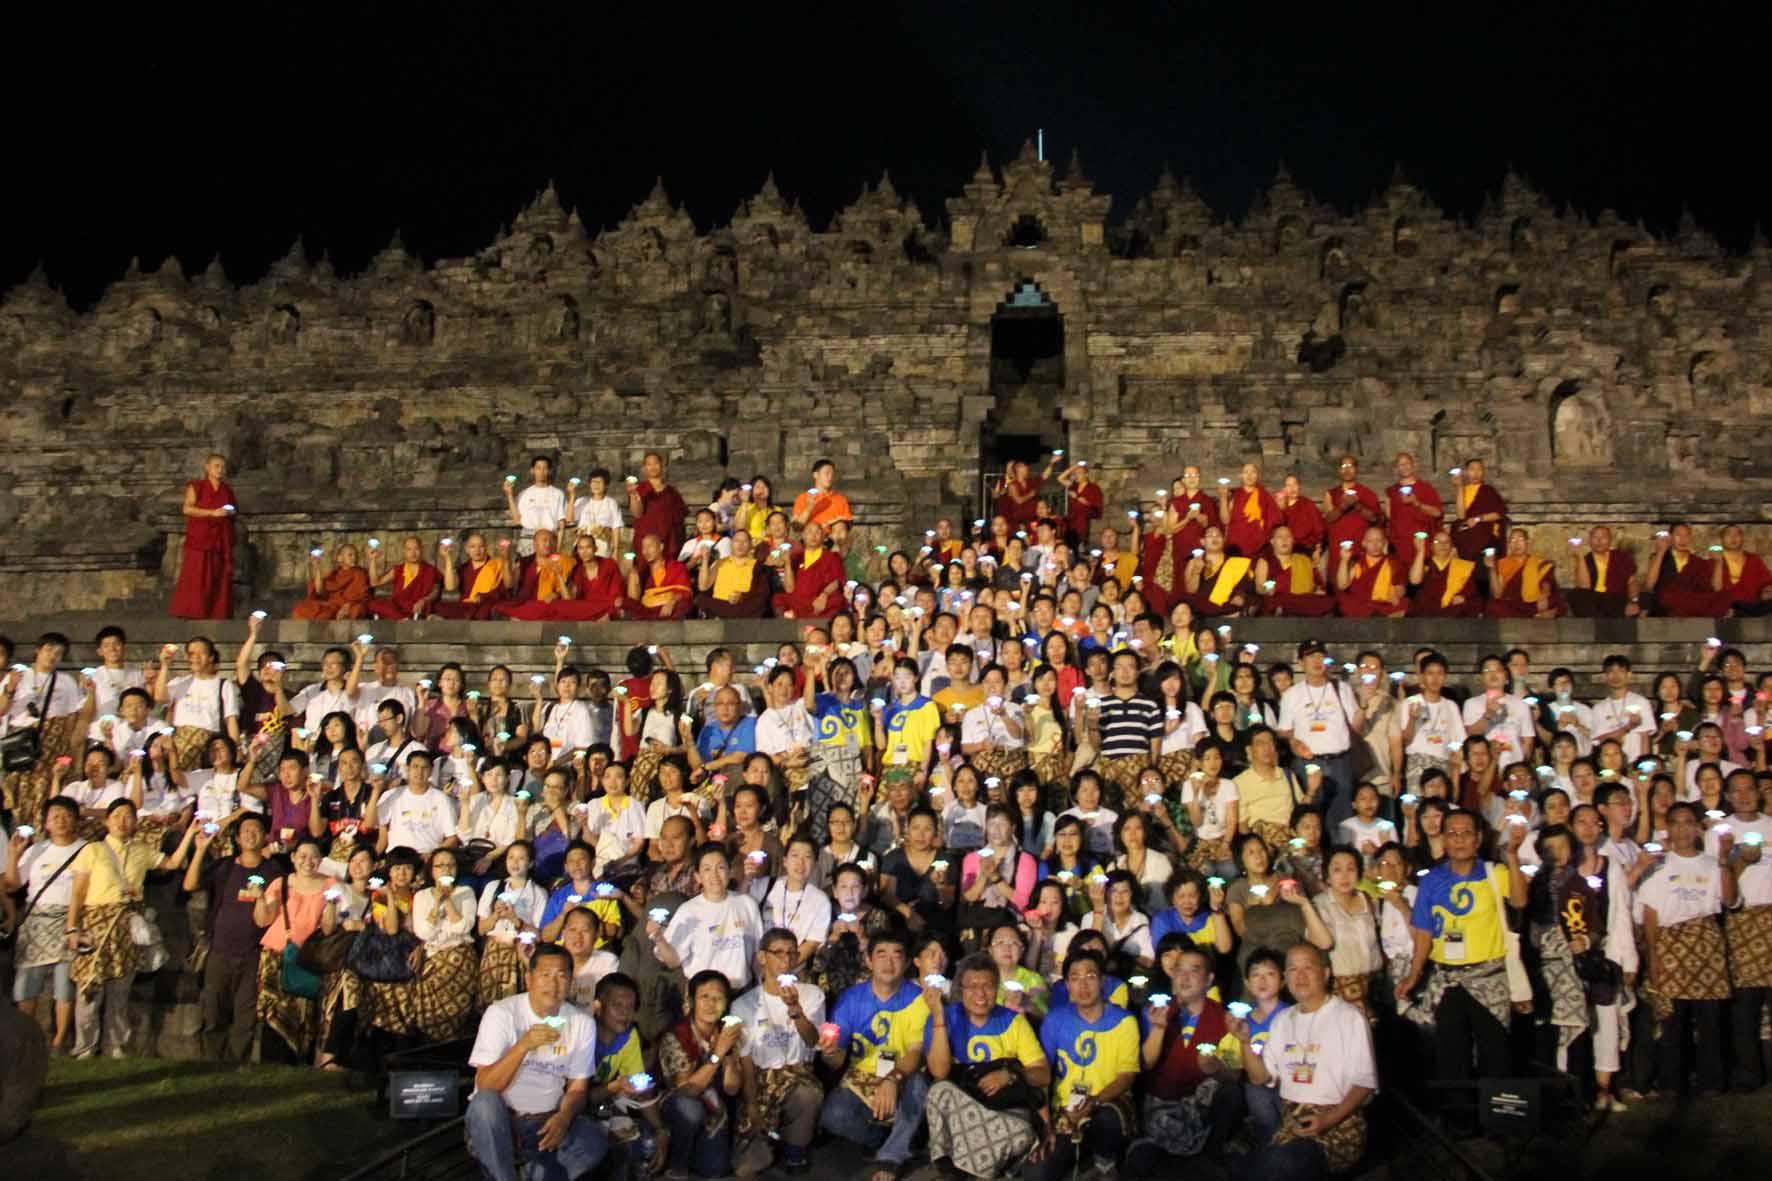 Sangha dan peserta berfoto bersama di Candi Borobudur